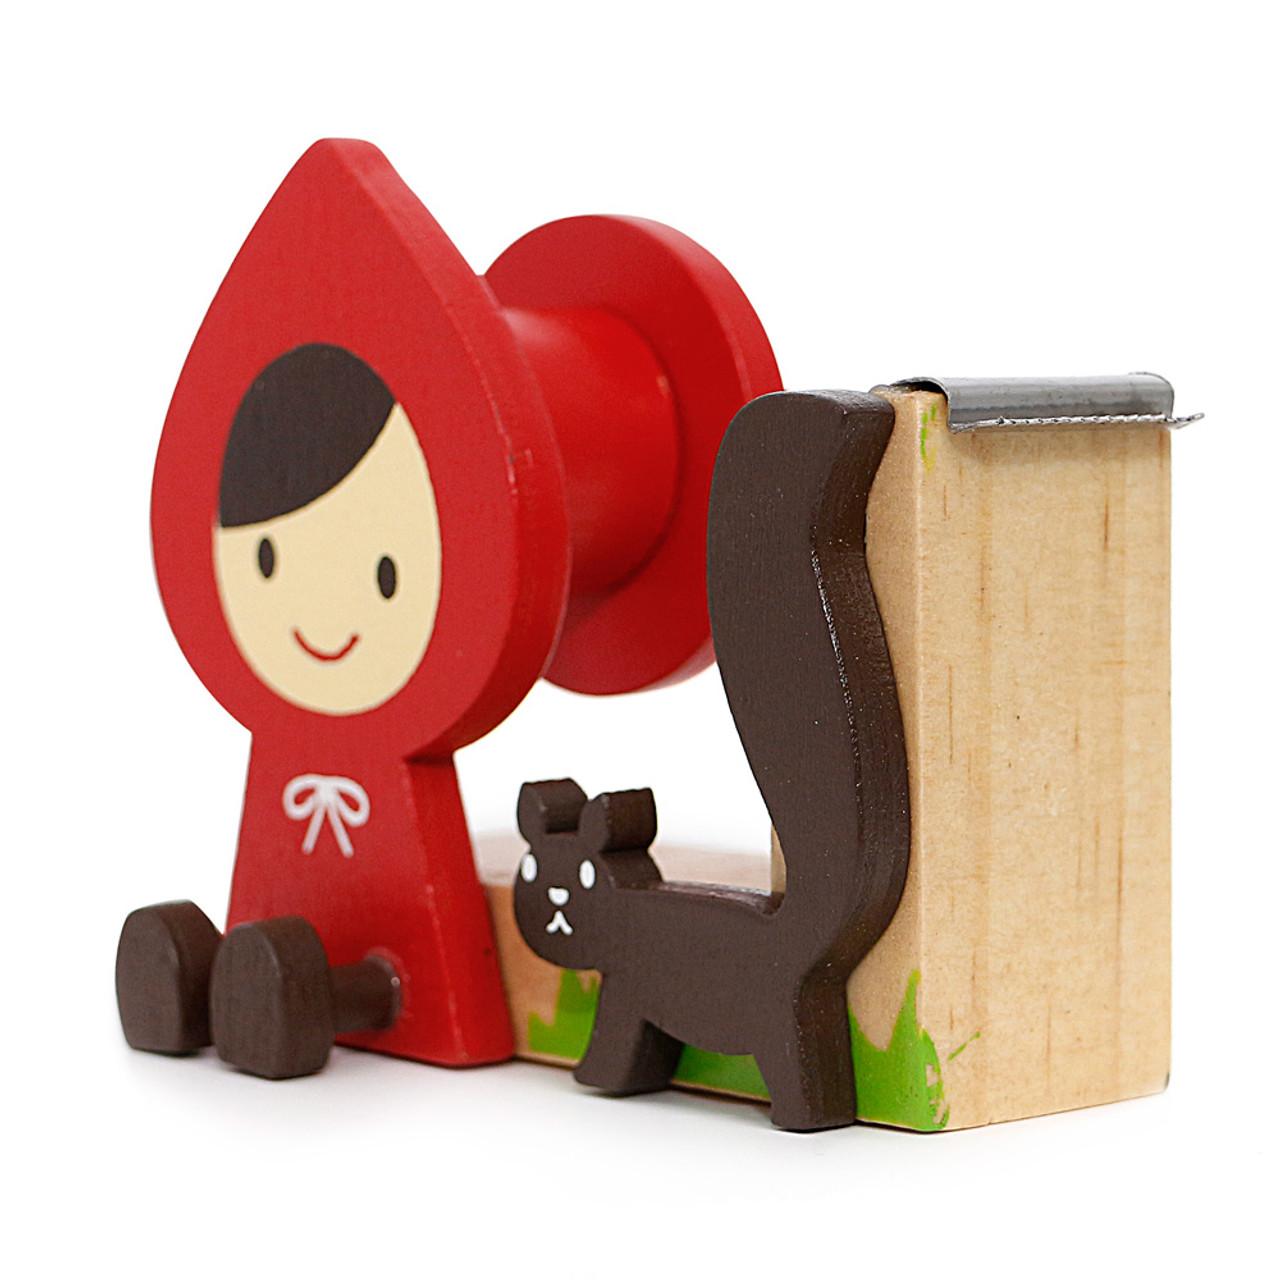 Decole Little Red Hood Tape Dispenser ( Side View )